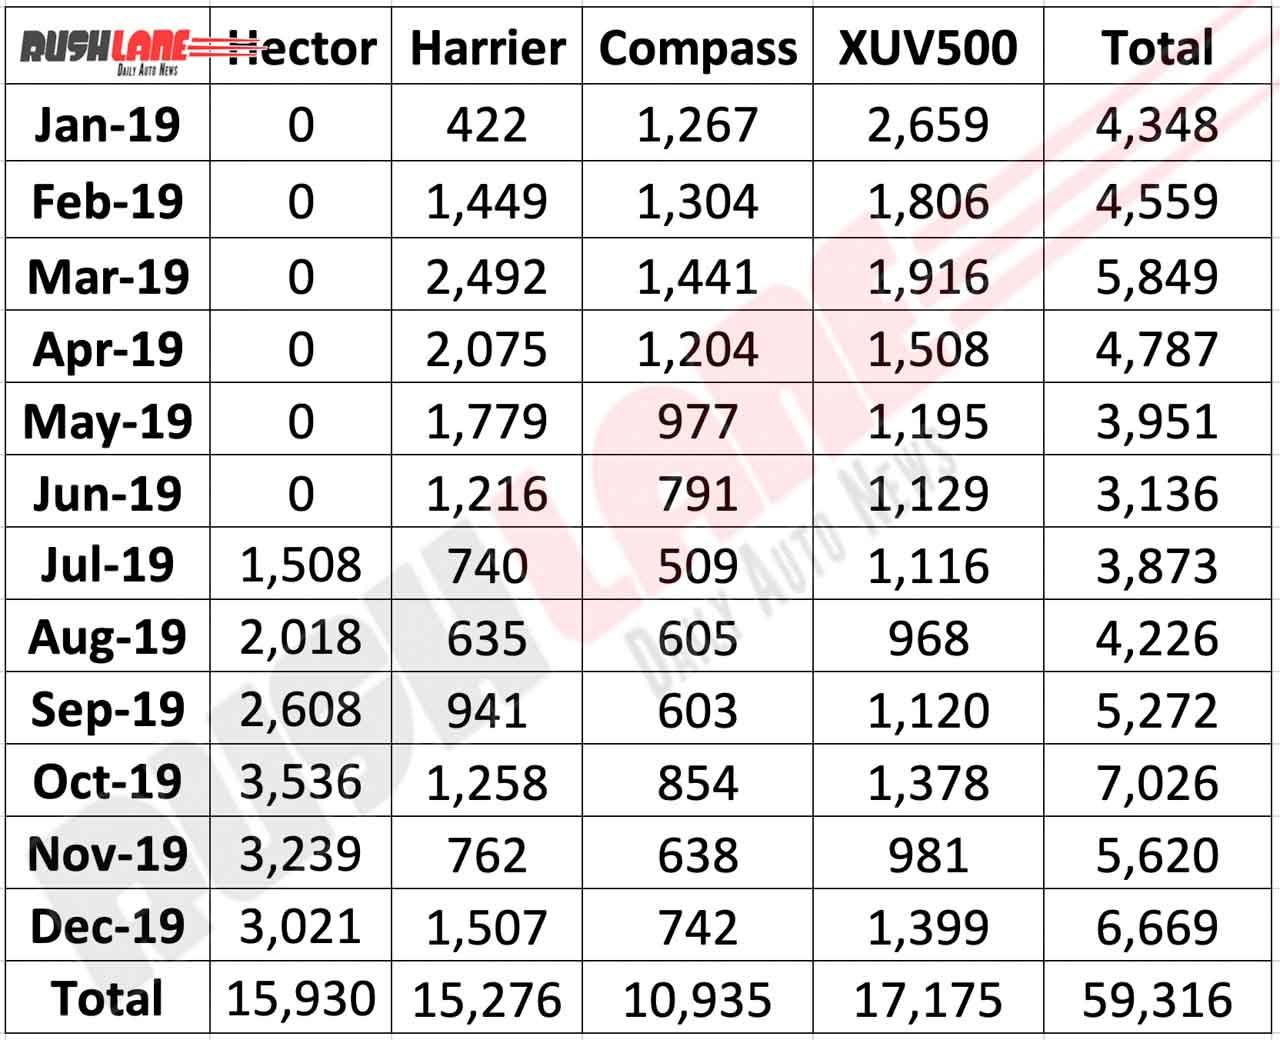 MG Hector vs rival sales